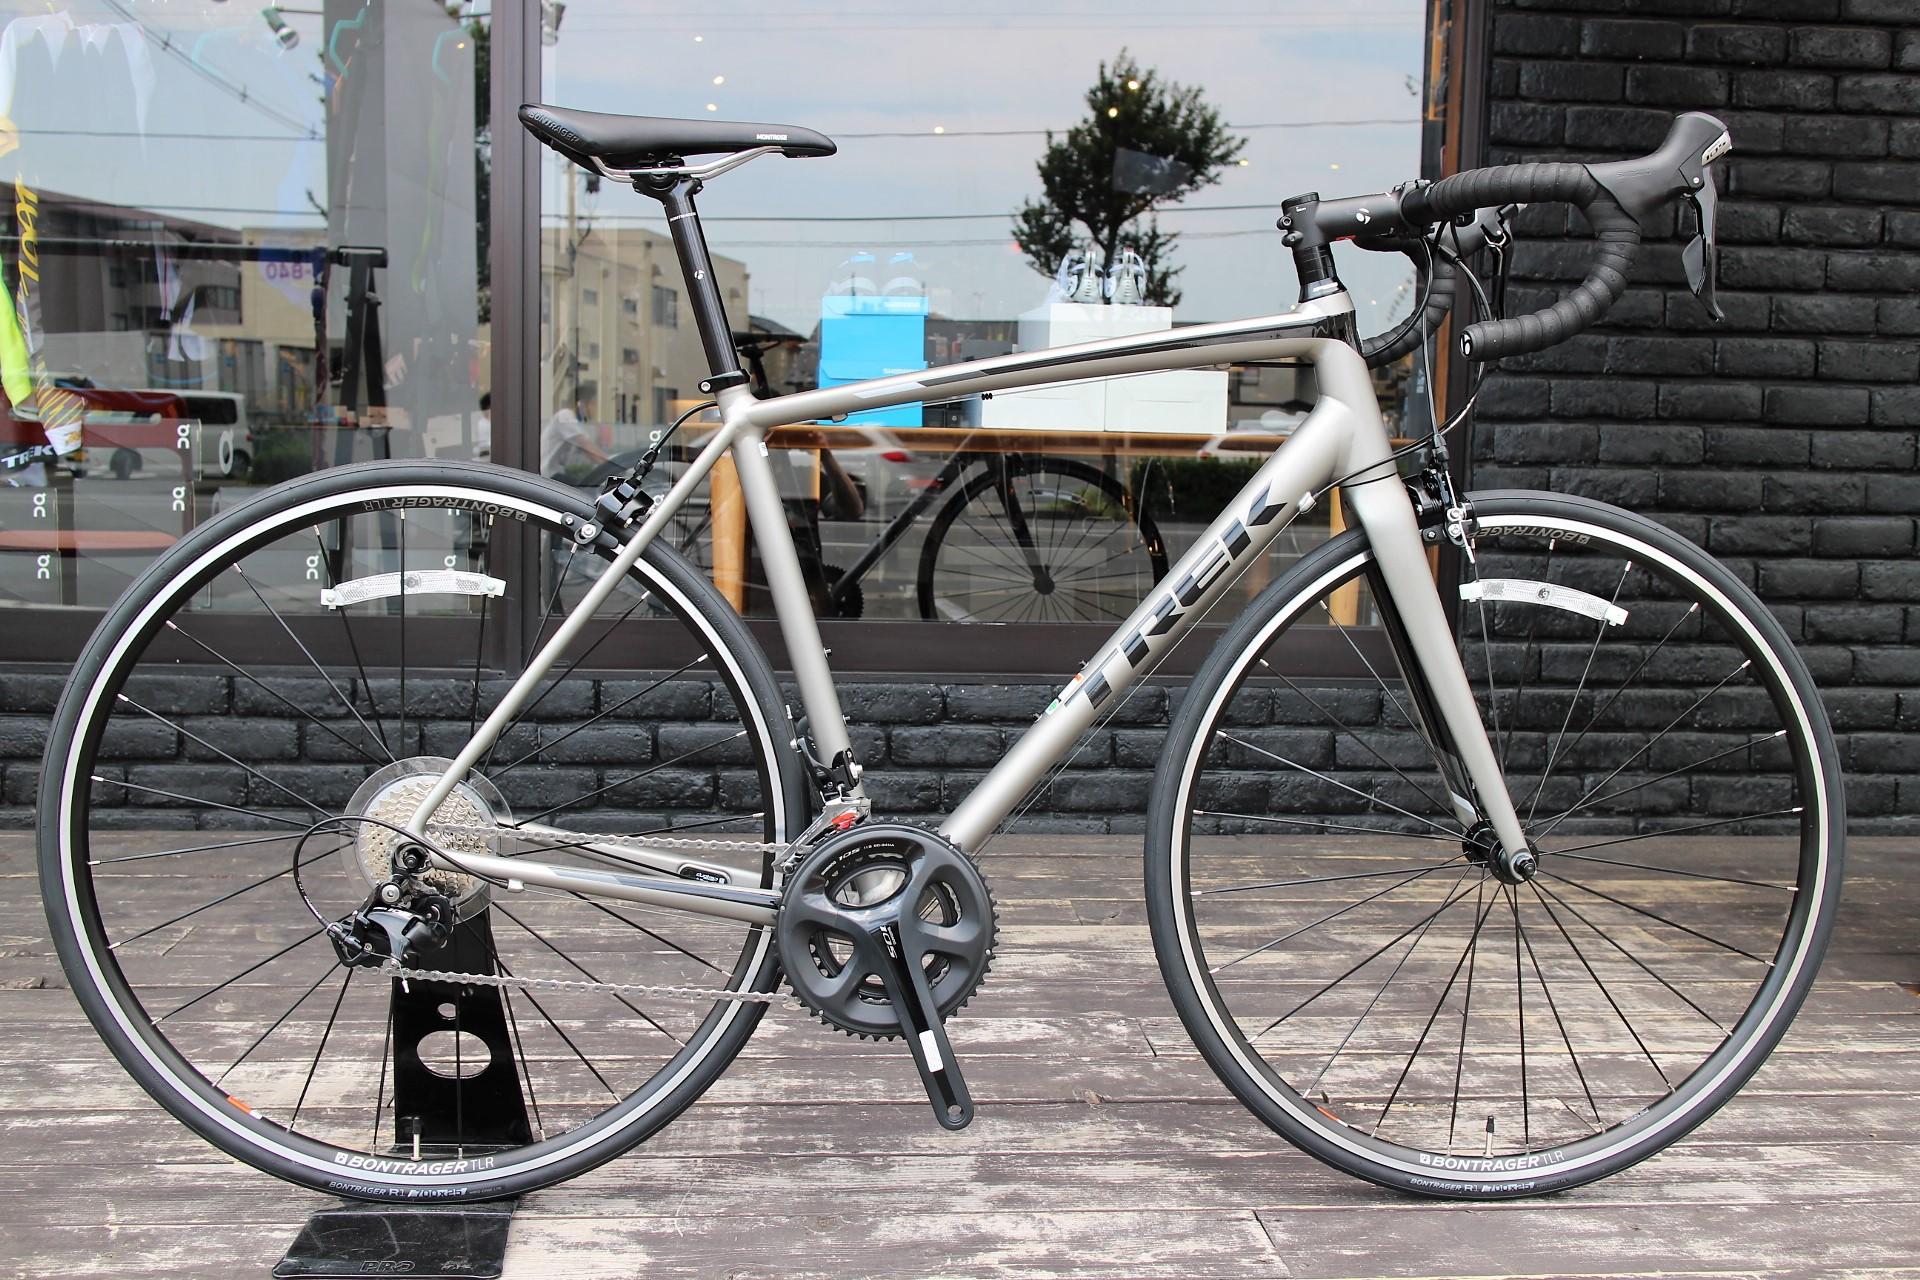 http://www.brenda-bicycle.com/brendablog/wp-content/uploads/sites/2/2017/06/IMG_2475.jpg